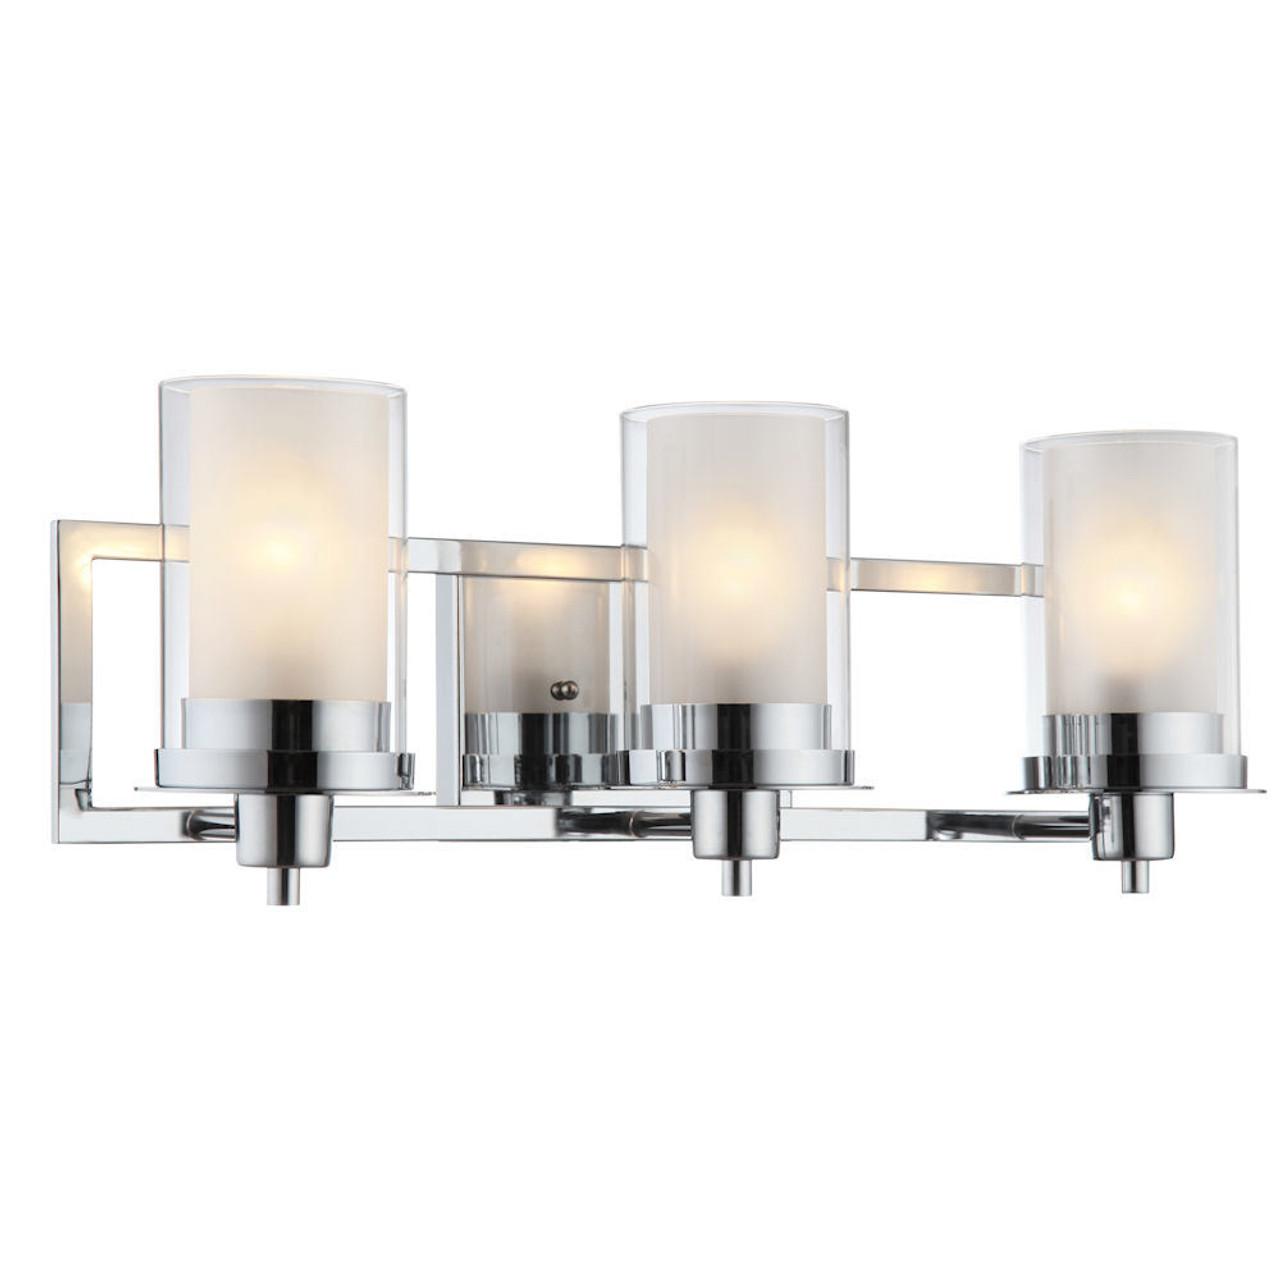 73487 Brushed Brass Juno Series 3 Light Bath /& Wall Fixture